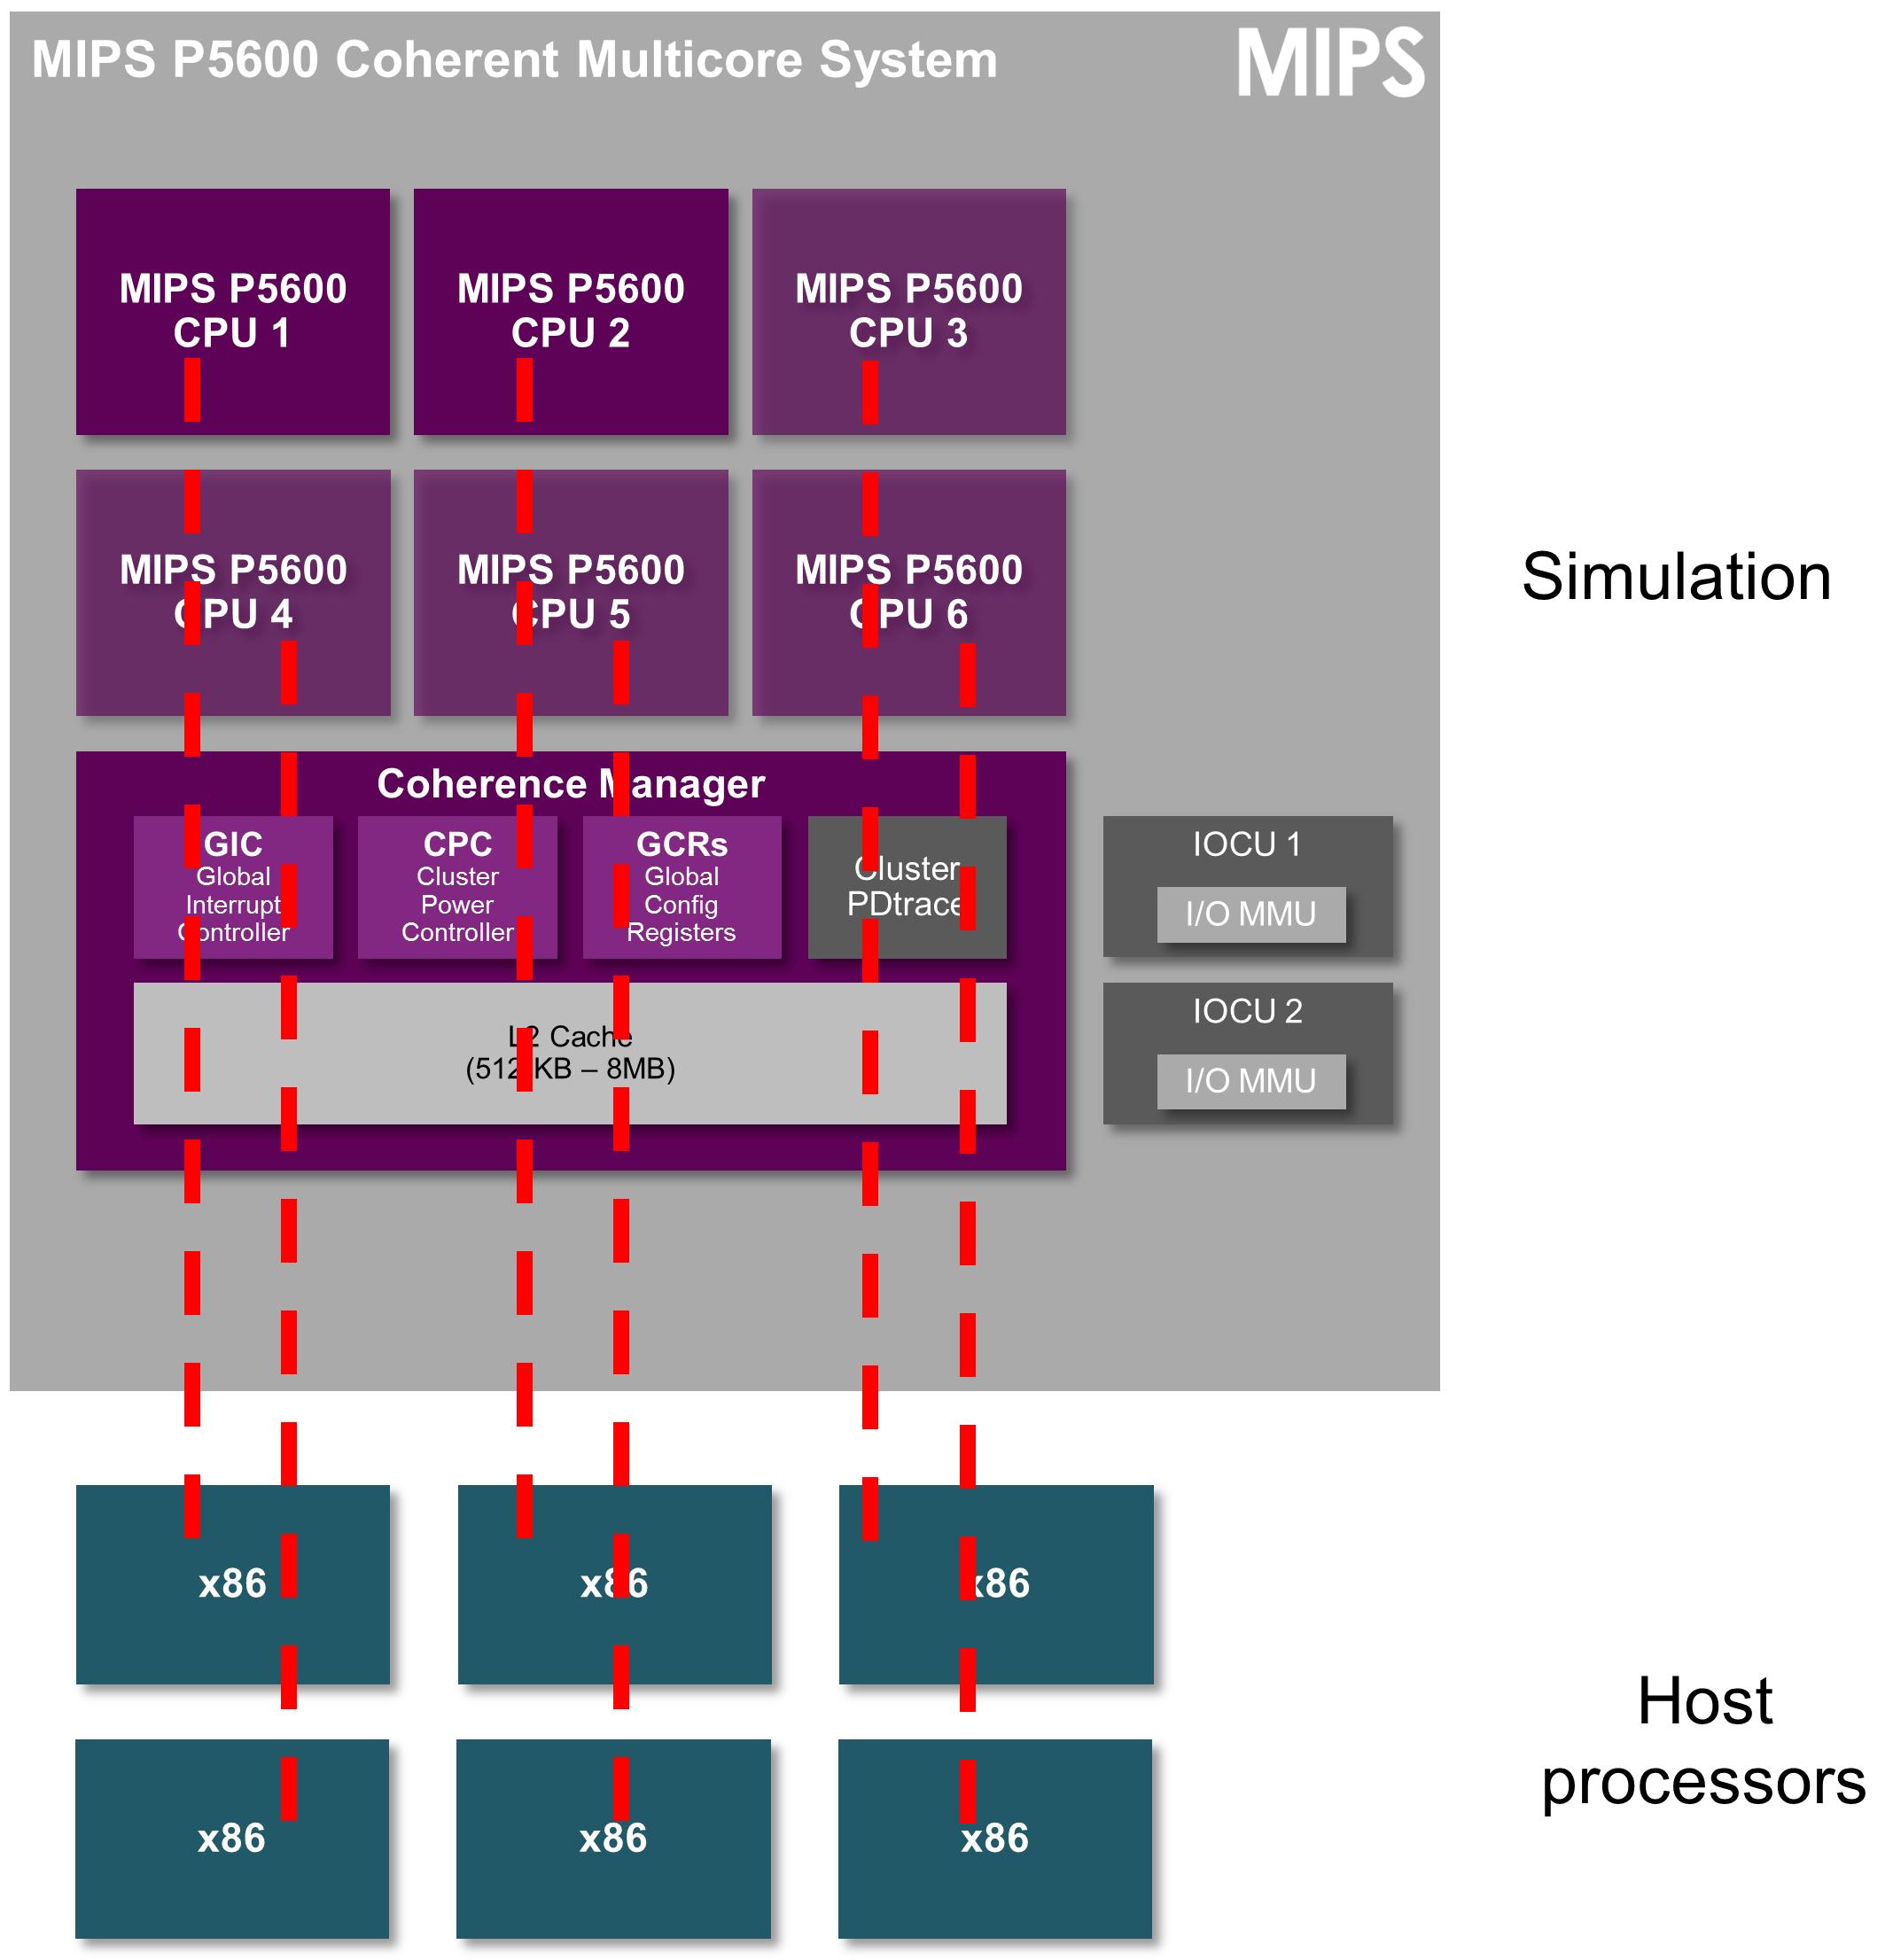 Virtual platofm - simulation and host processors